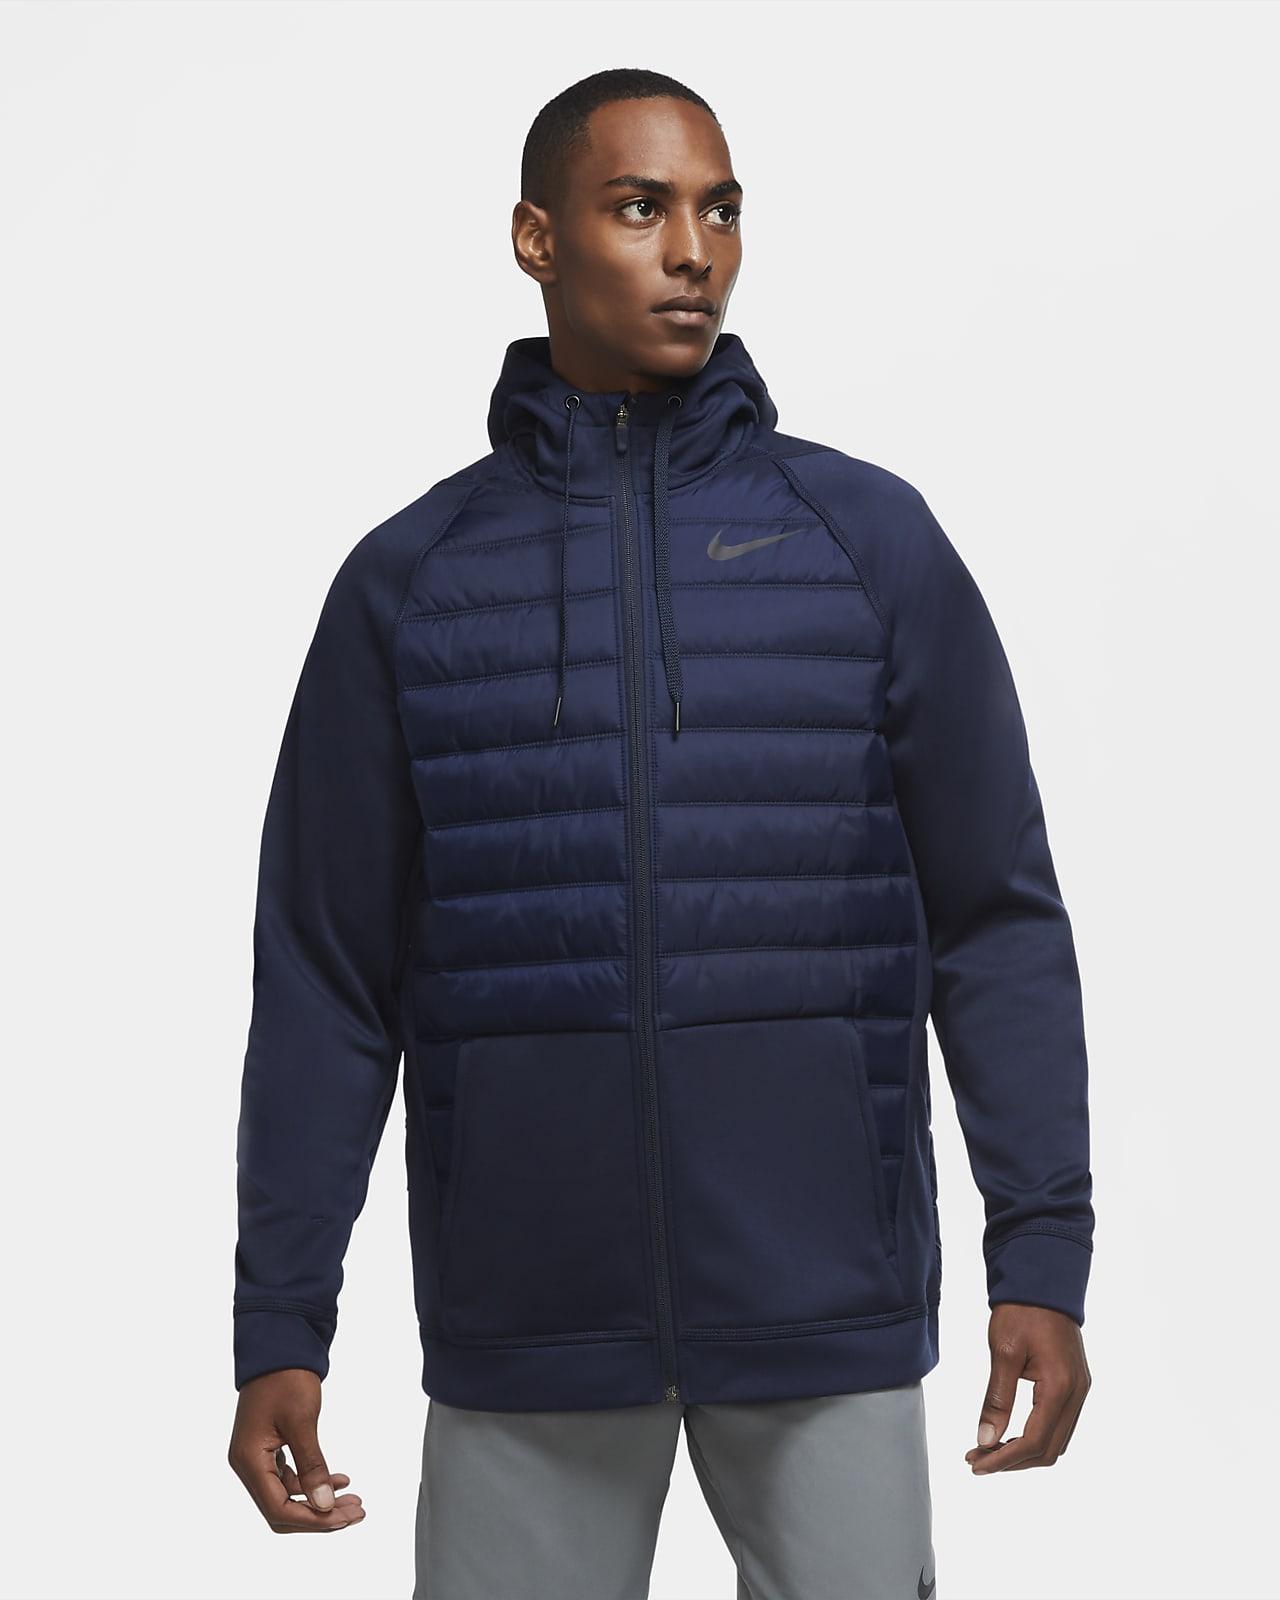 Nike Therma Men's Full-Zip Training Jacket